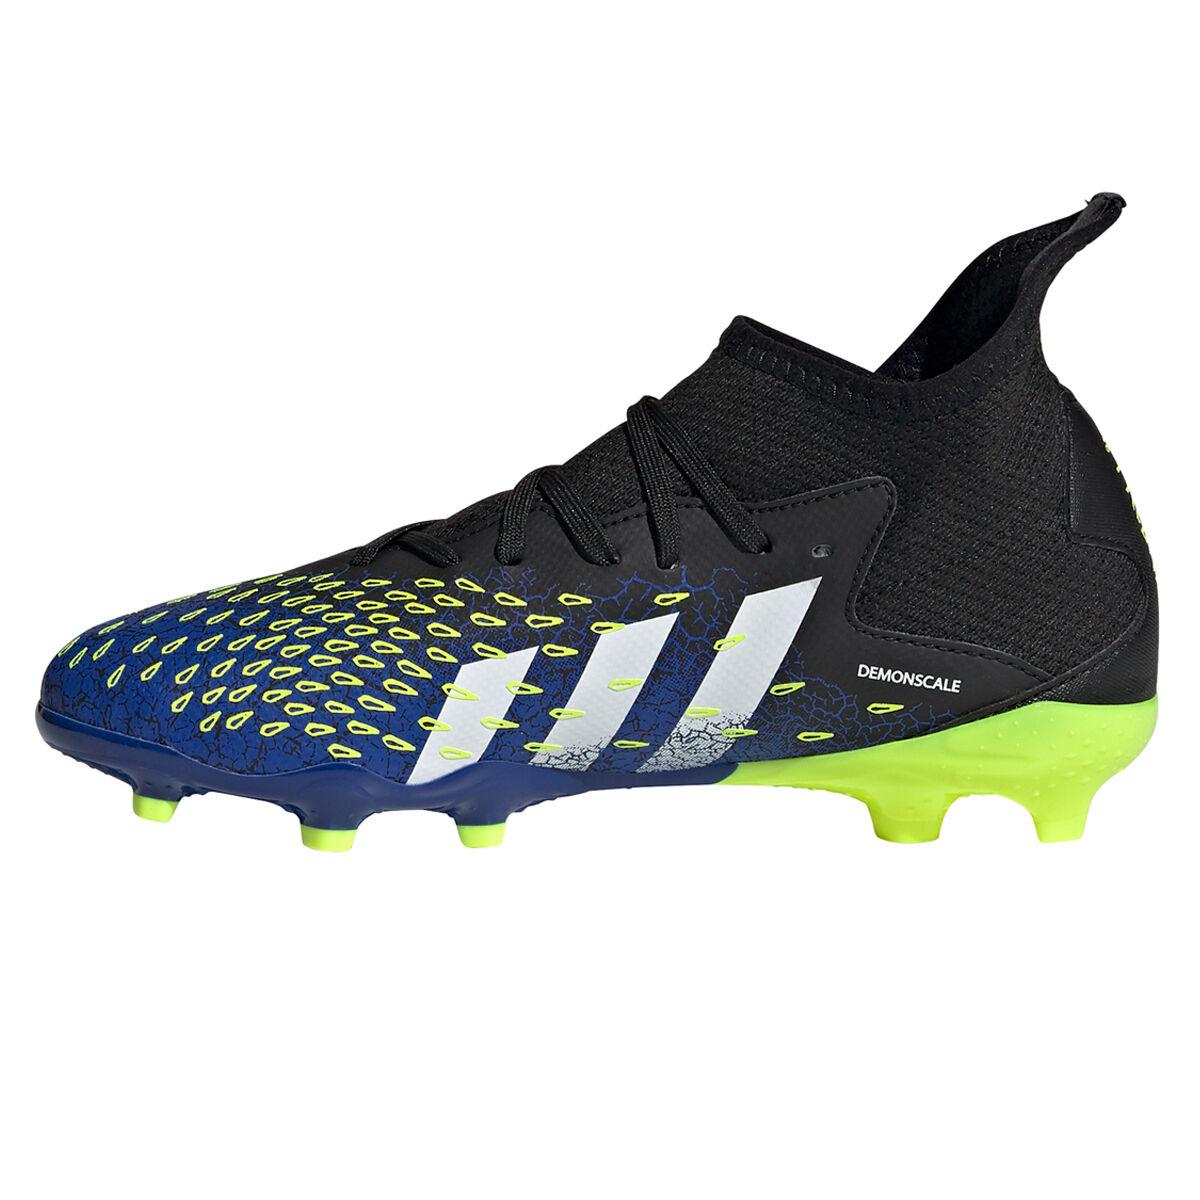 adidas lebanon prices today pakistan 2016 | adidas Predator Freak .3 Kids Football Boots